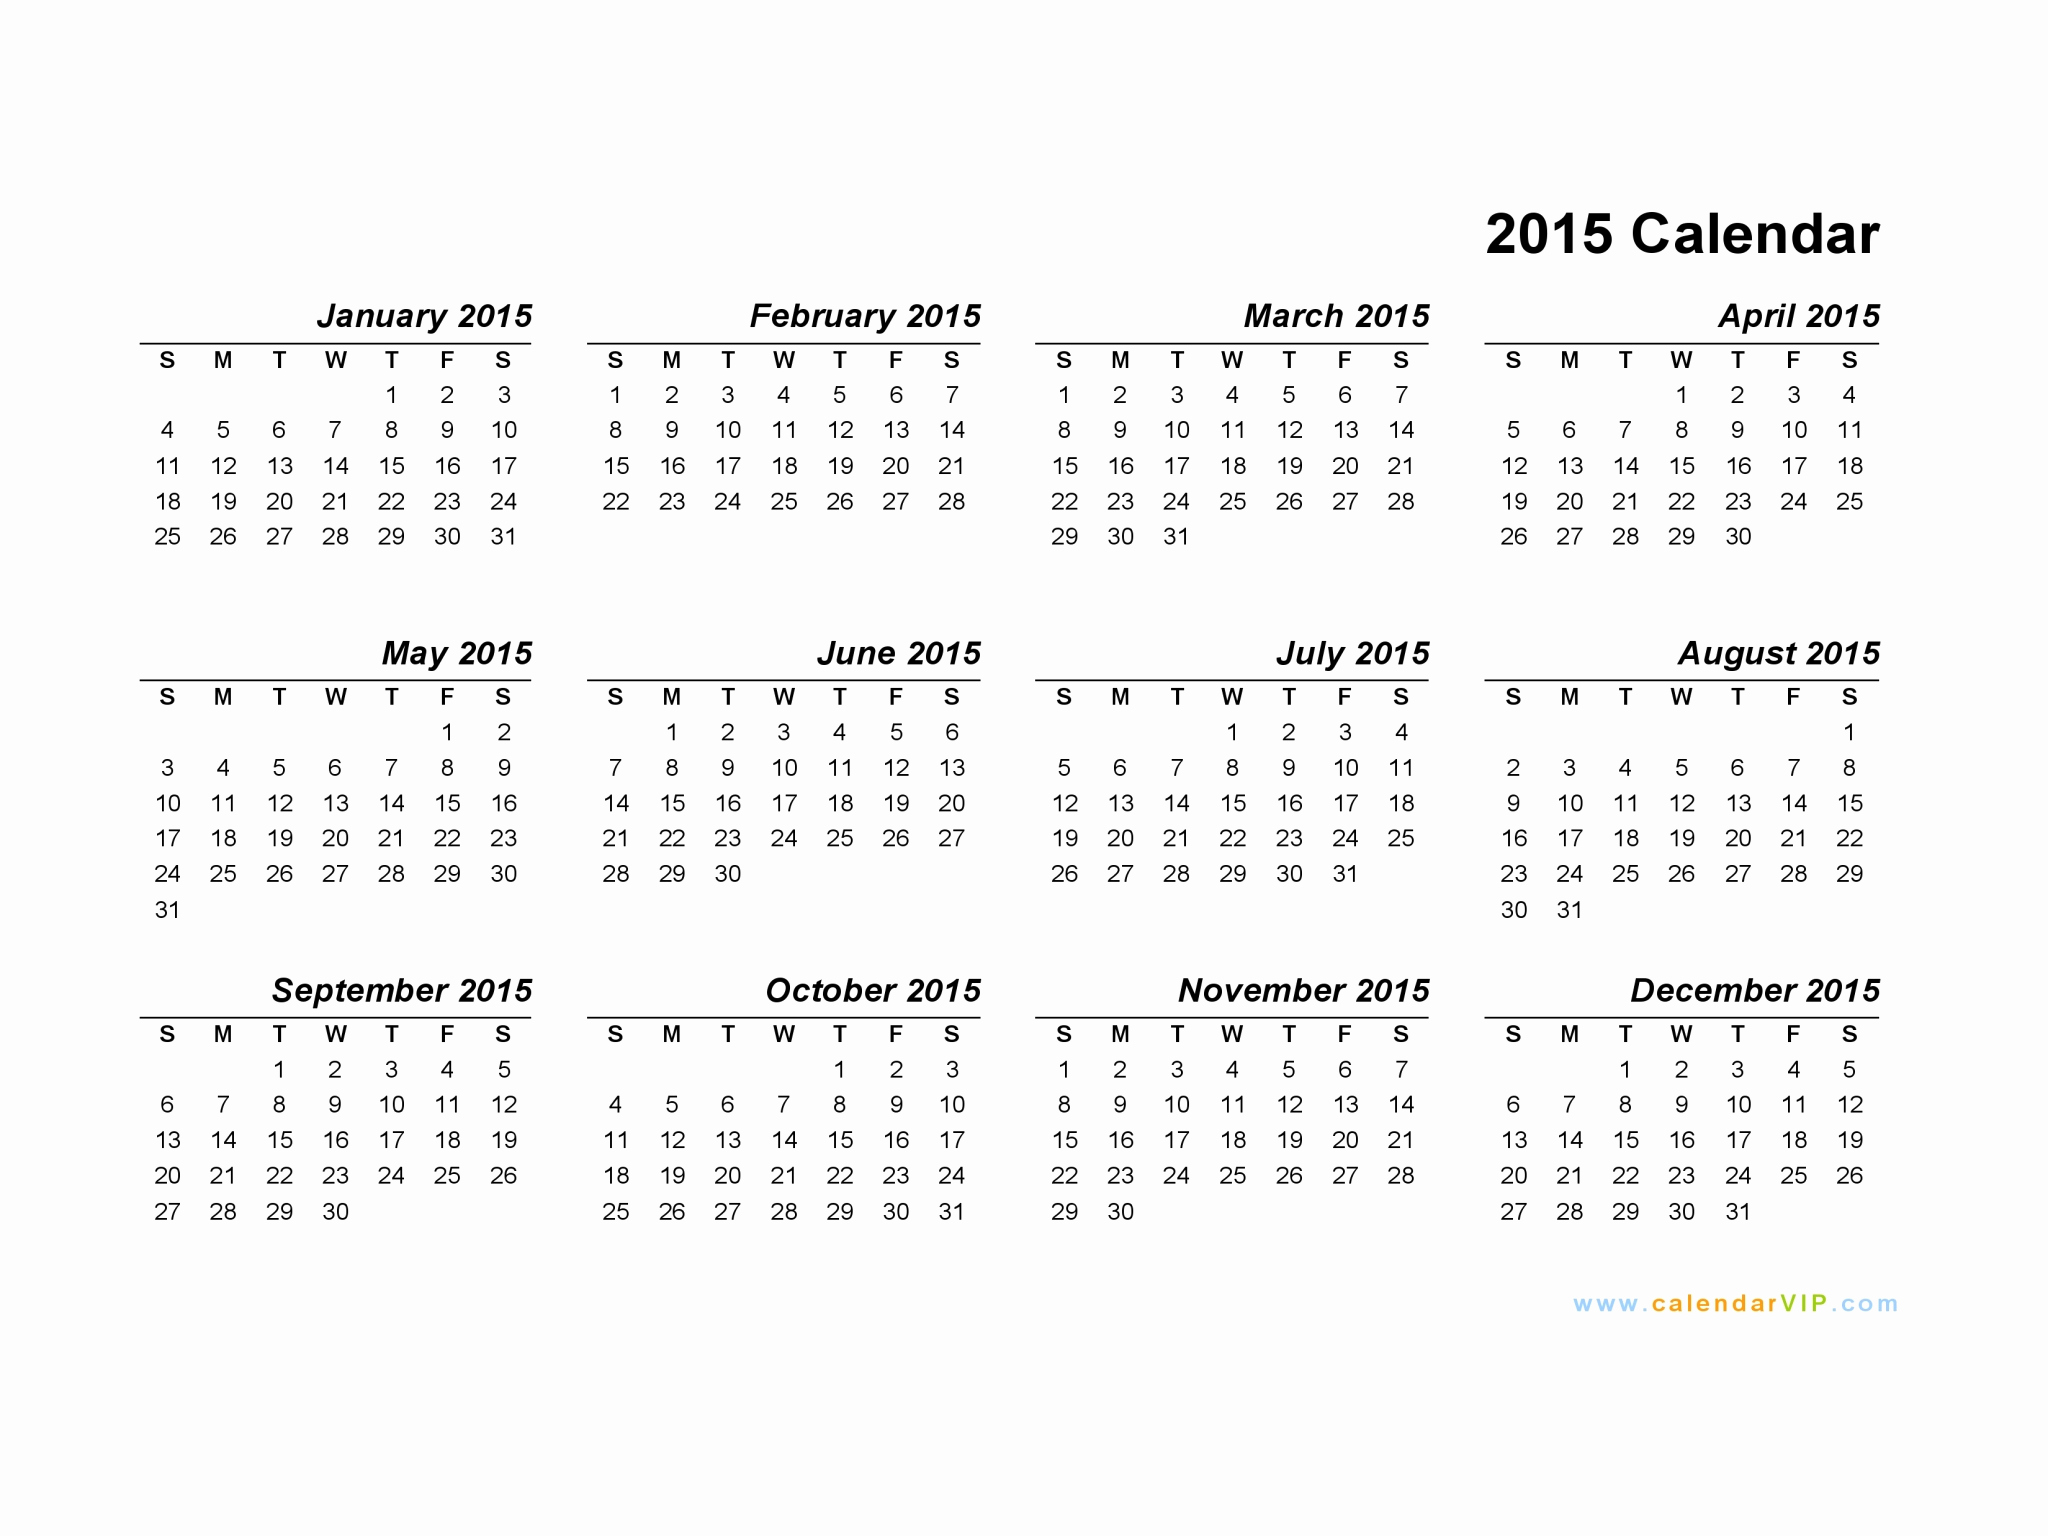 Blank Monthly Calendar Template Pdf Elegant 2015 Calendar Blank Printable Calendar Template In Pdf